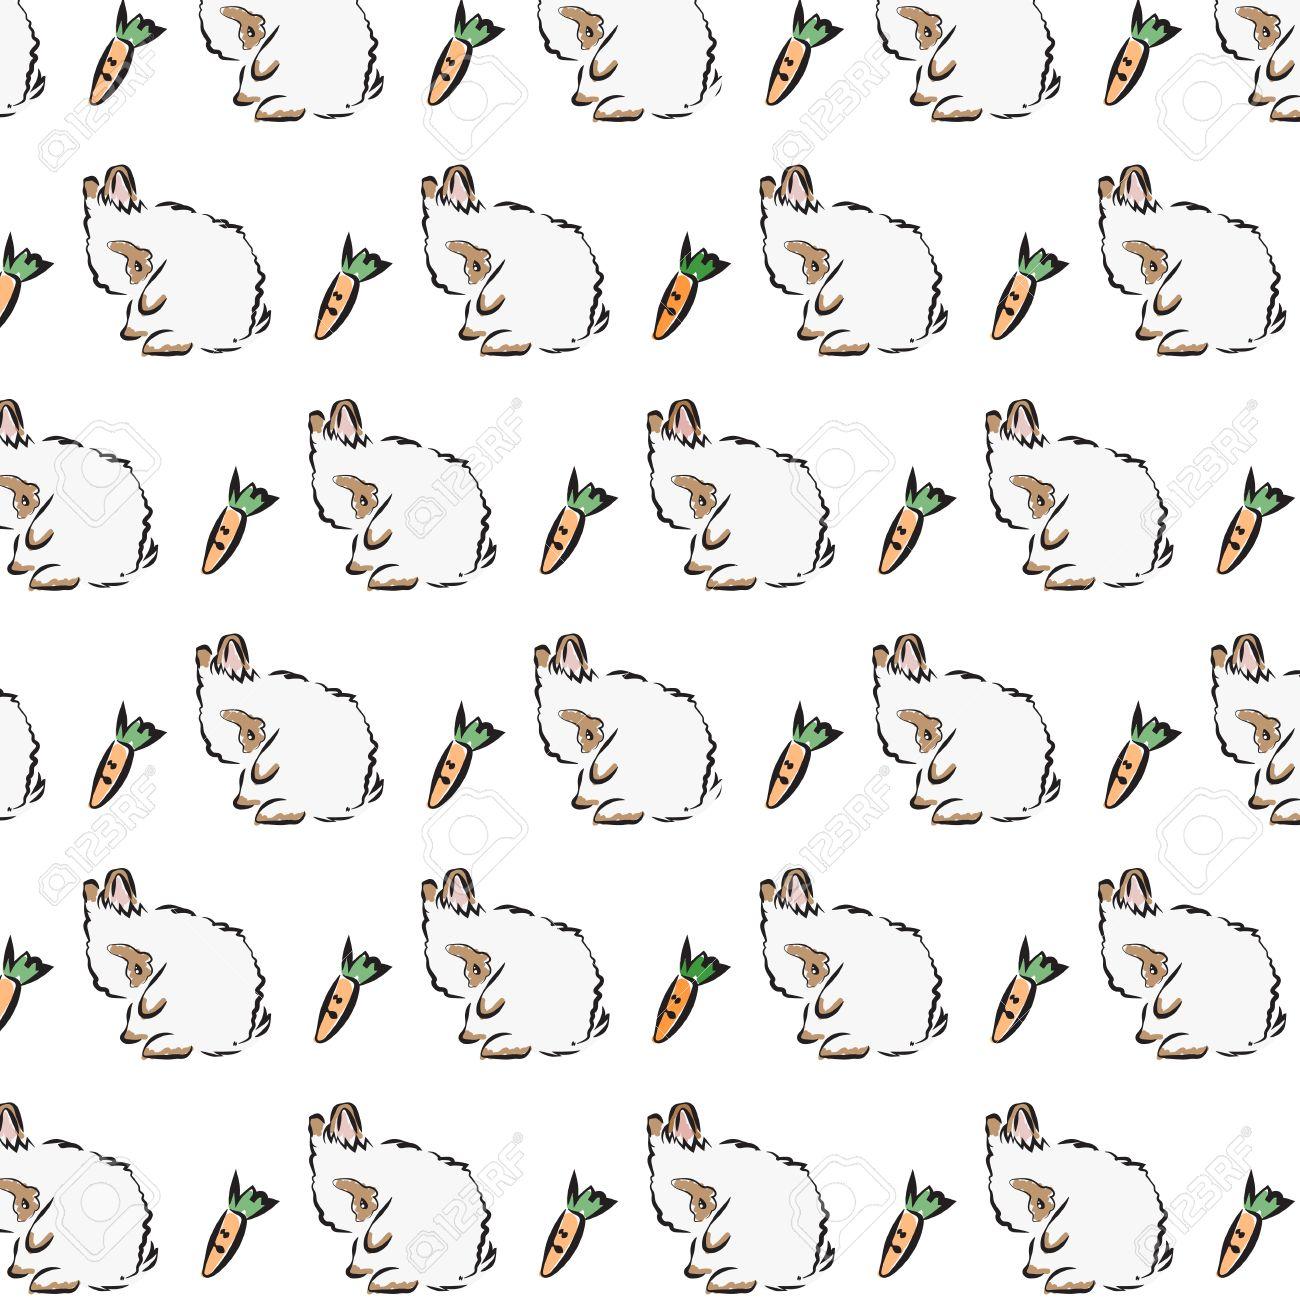 vector illustration of outline lovely bunny pattern on a white